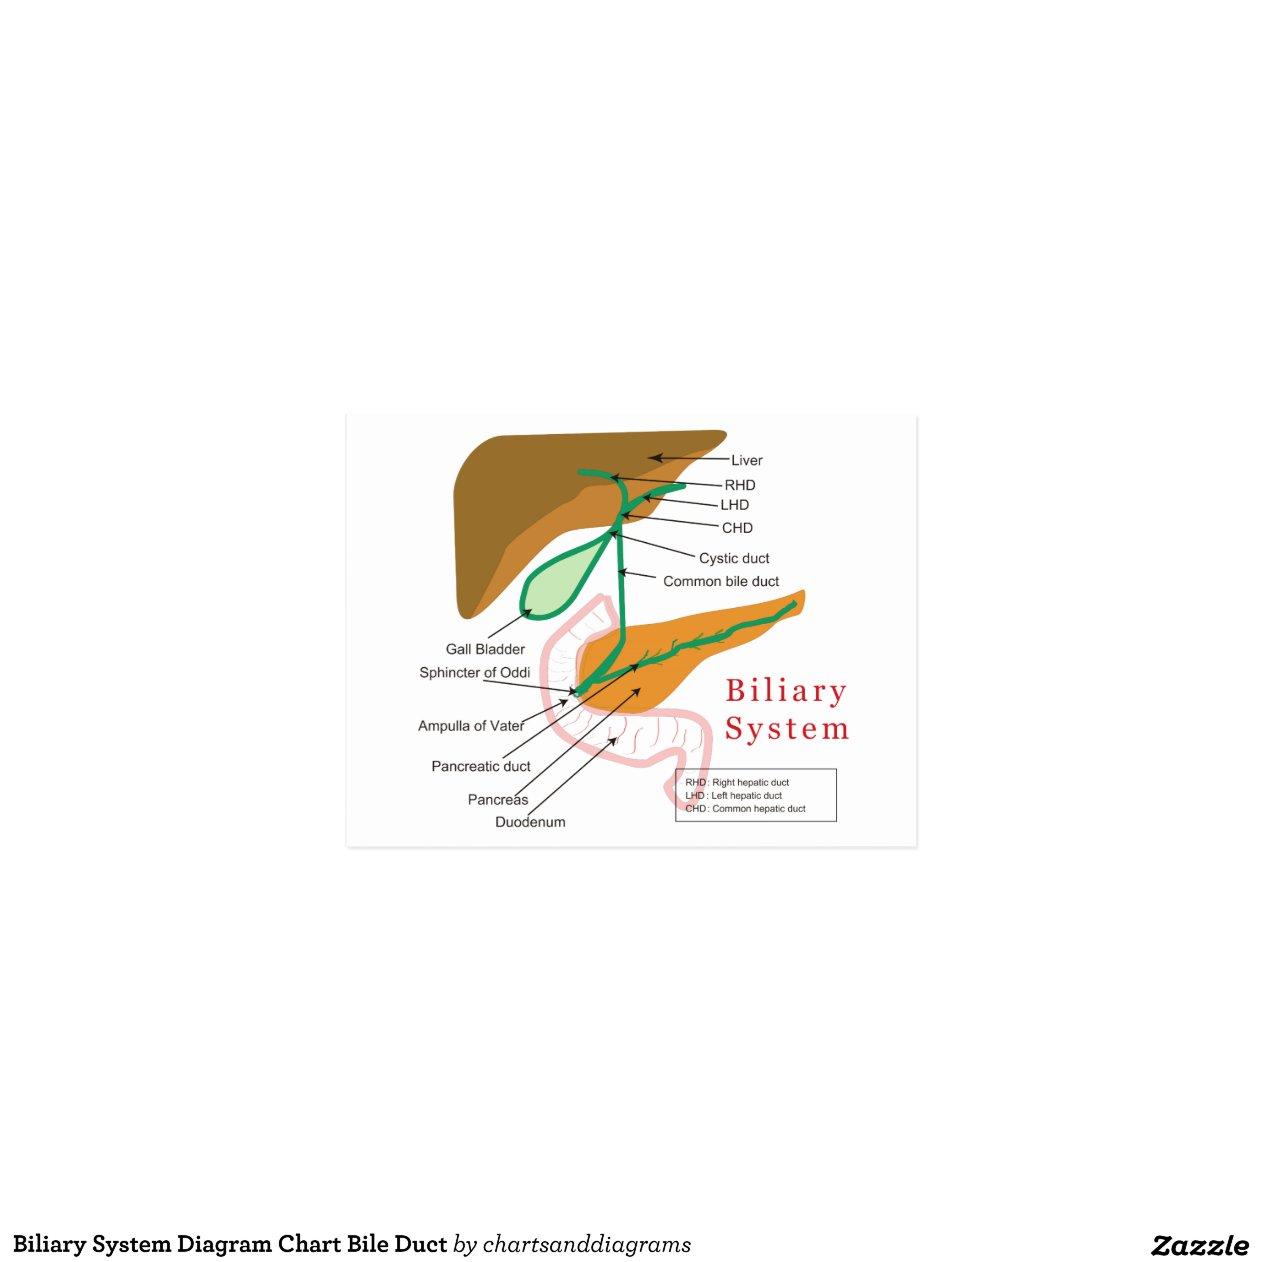 Biliary System Diagram Chart Bile Duct   Zazzle